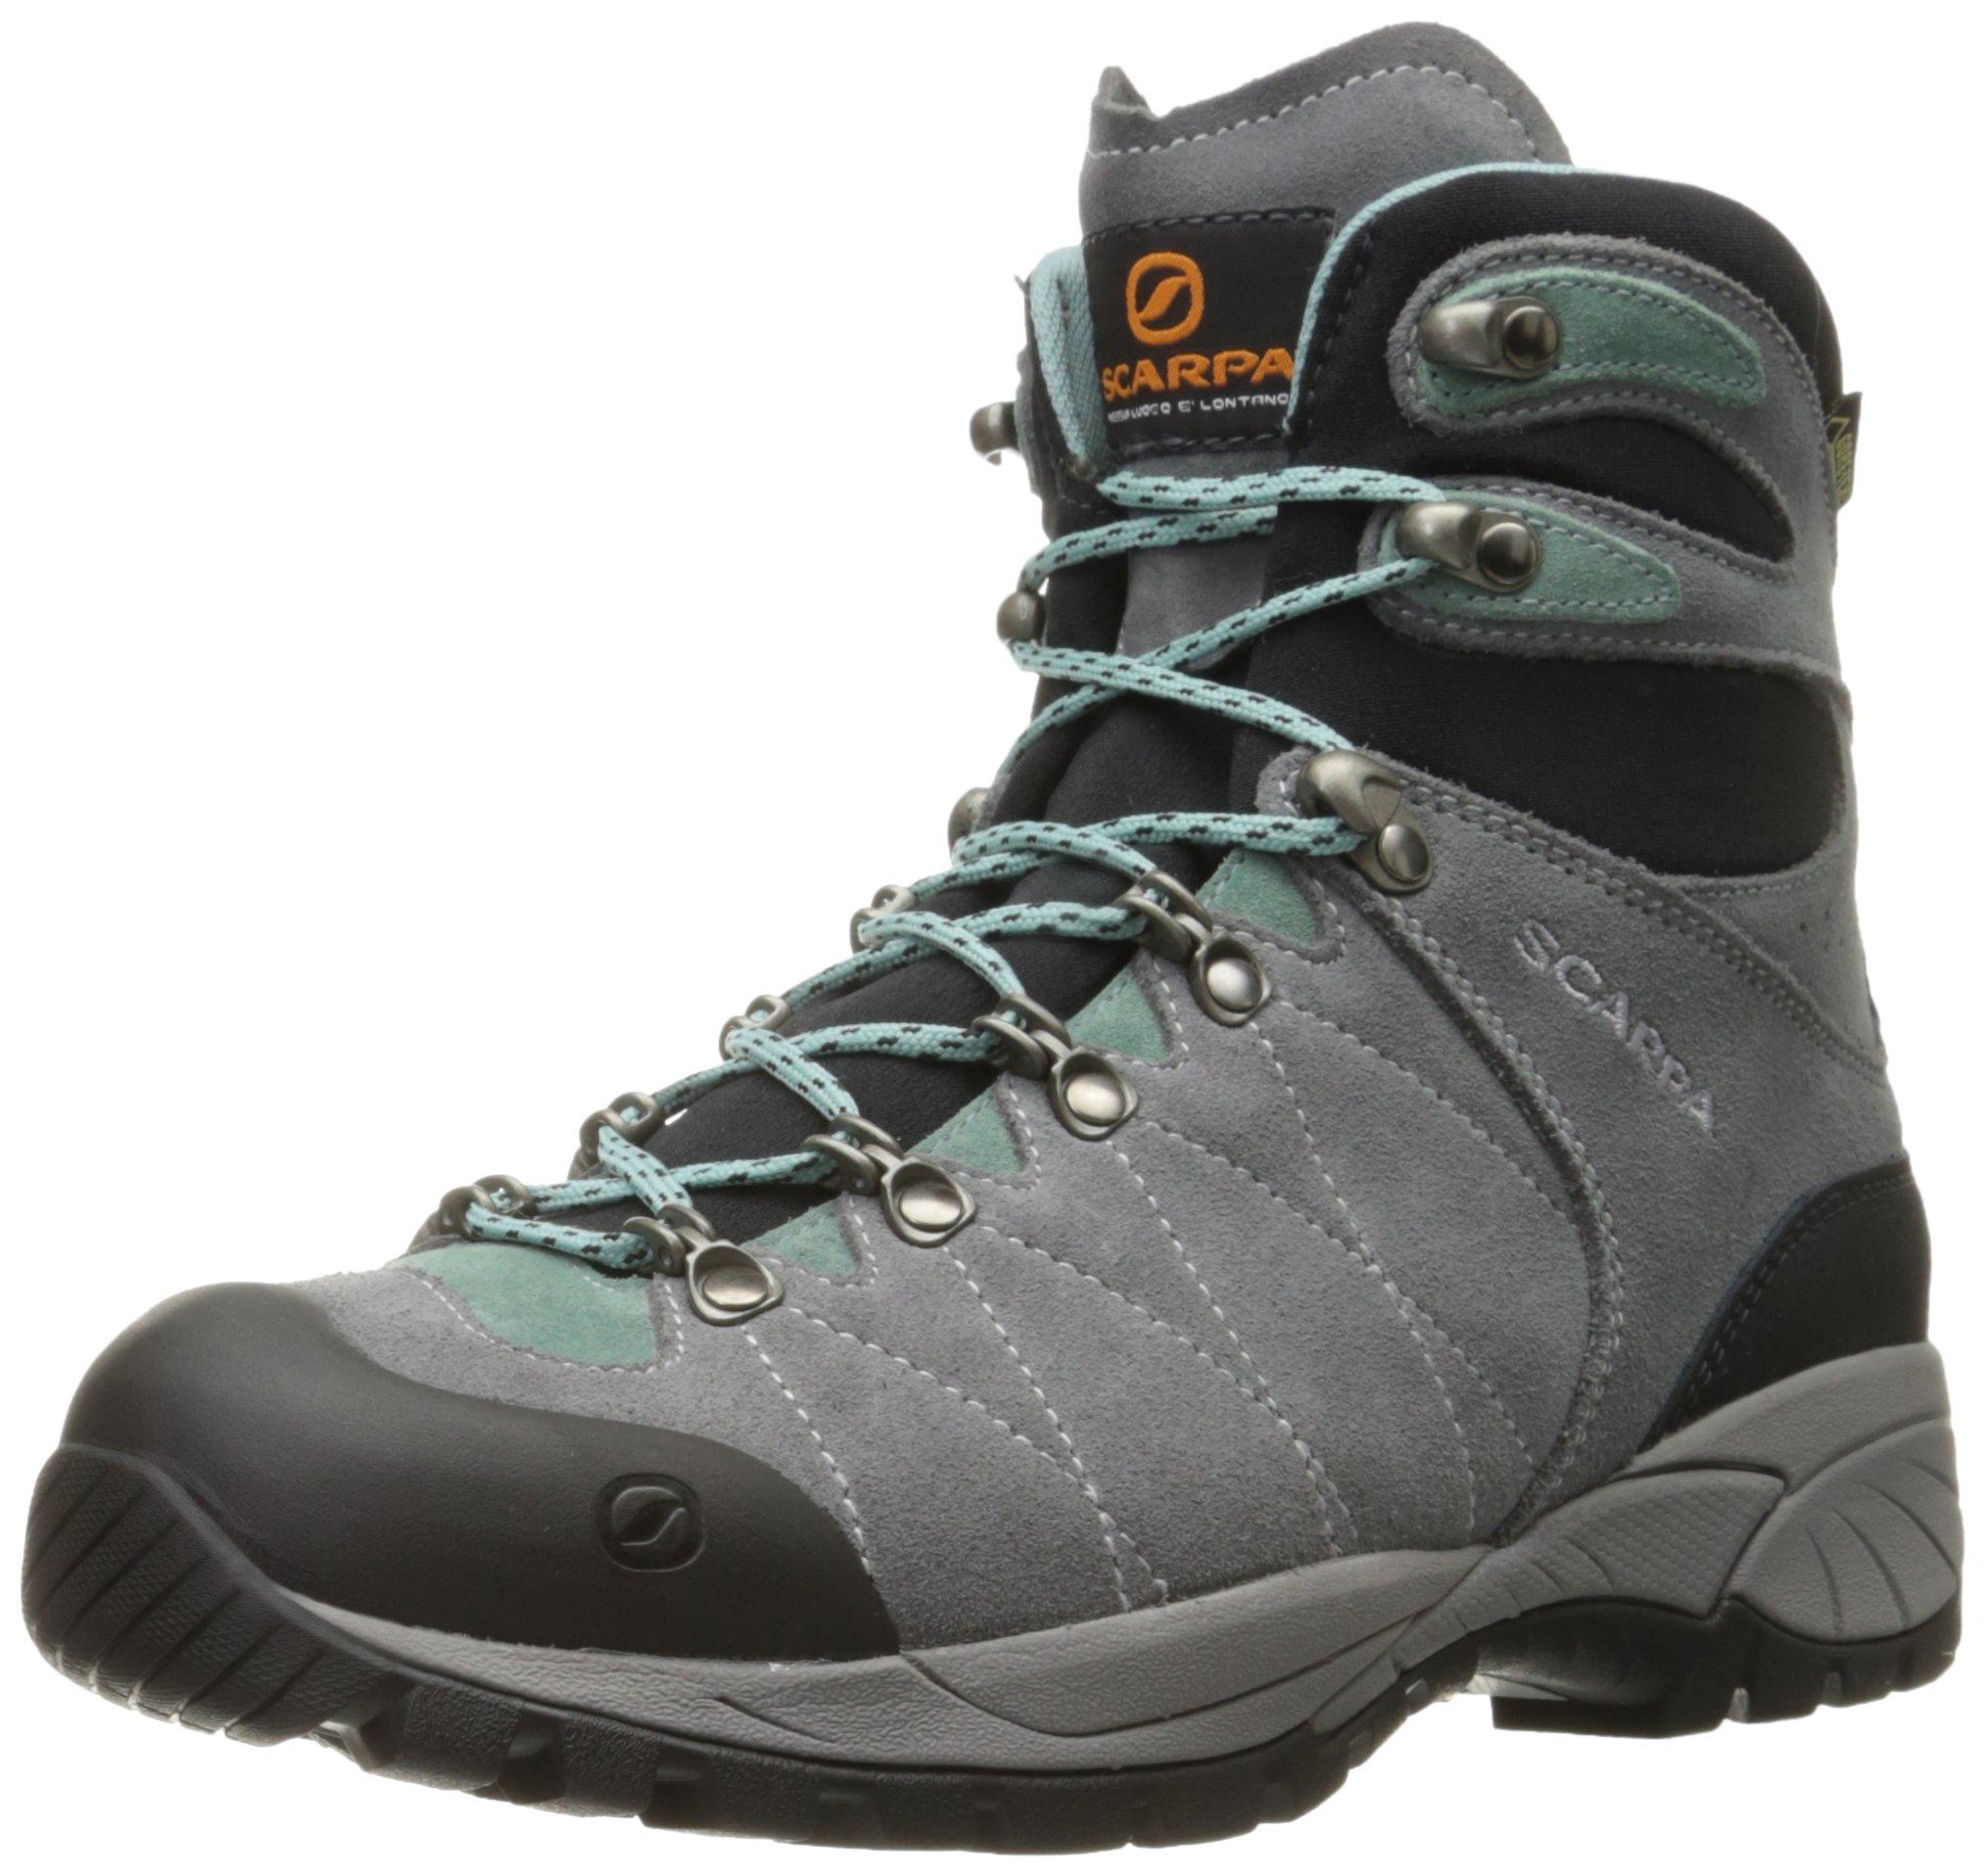 Scarpa Women's R-Evolution GTX Wmn Hiking Boot, Smoke/Jade, 39.5 EU/8 M US